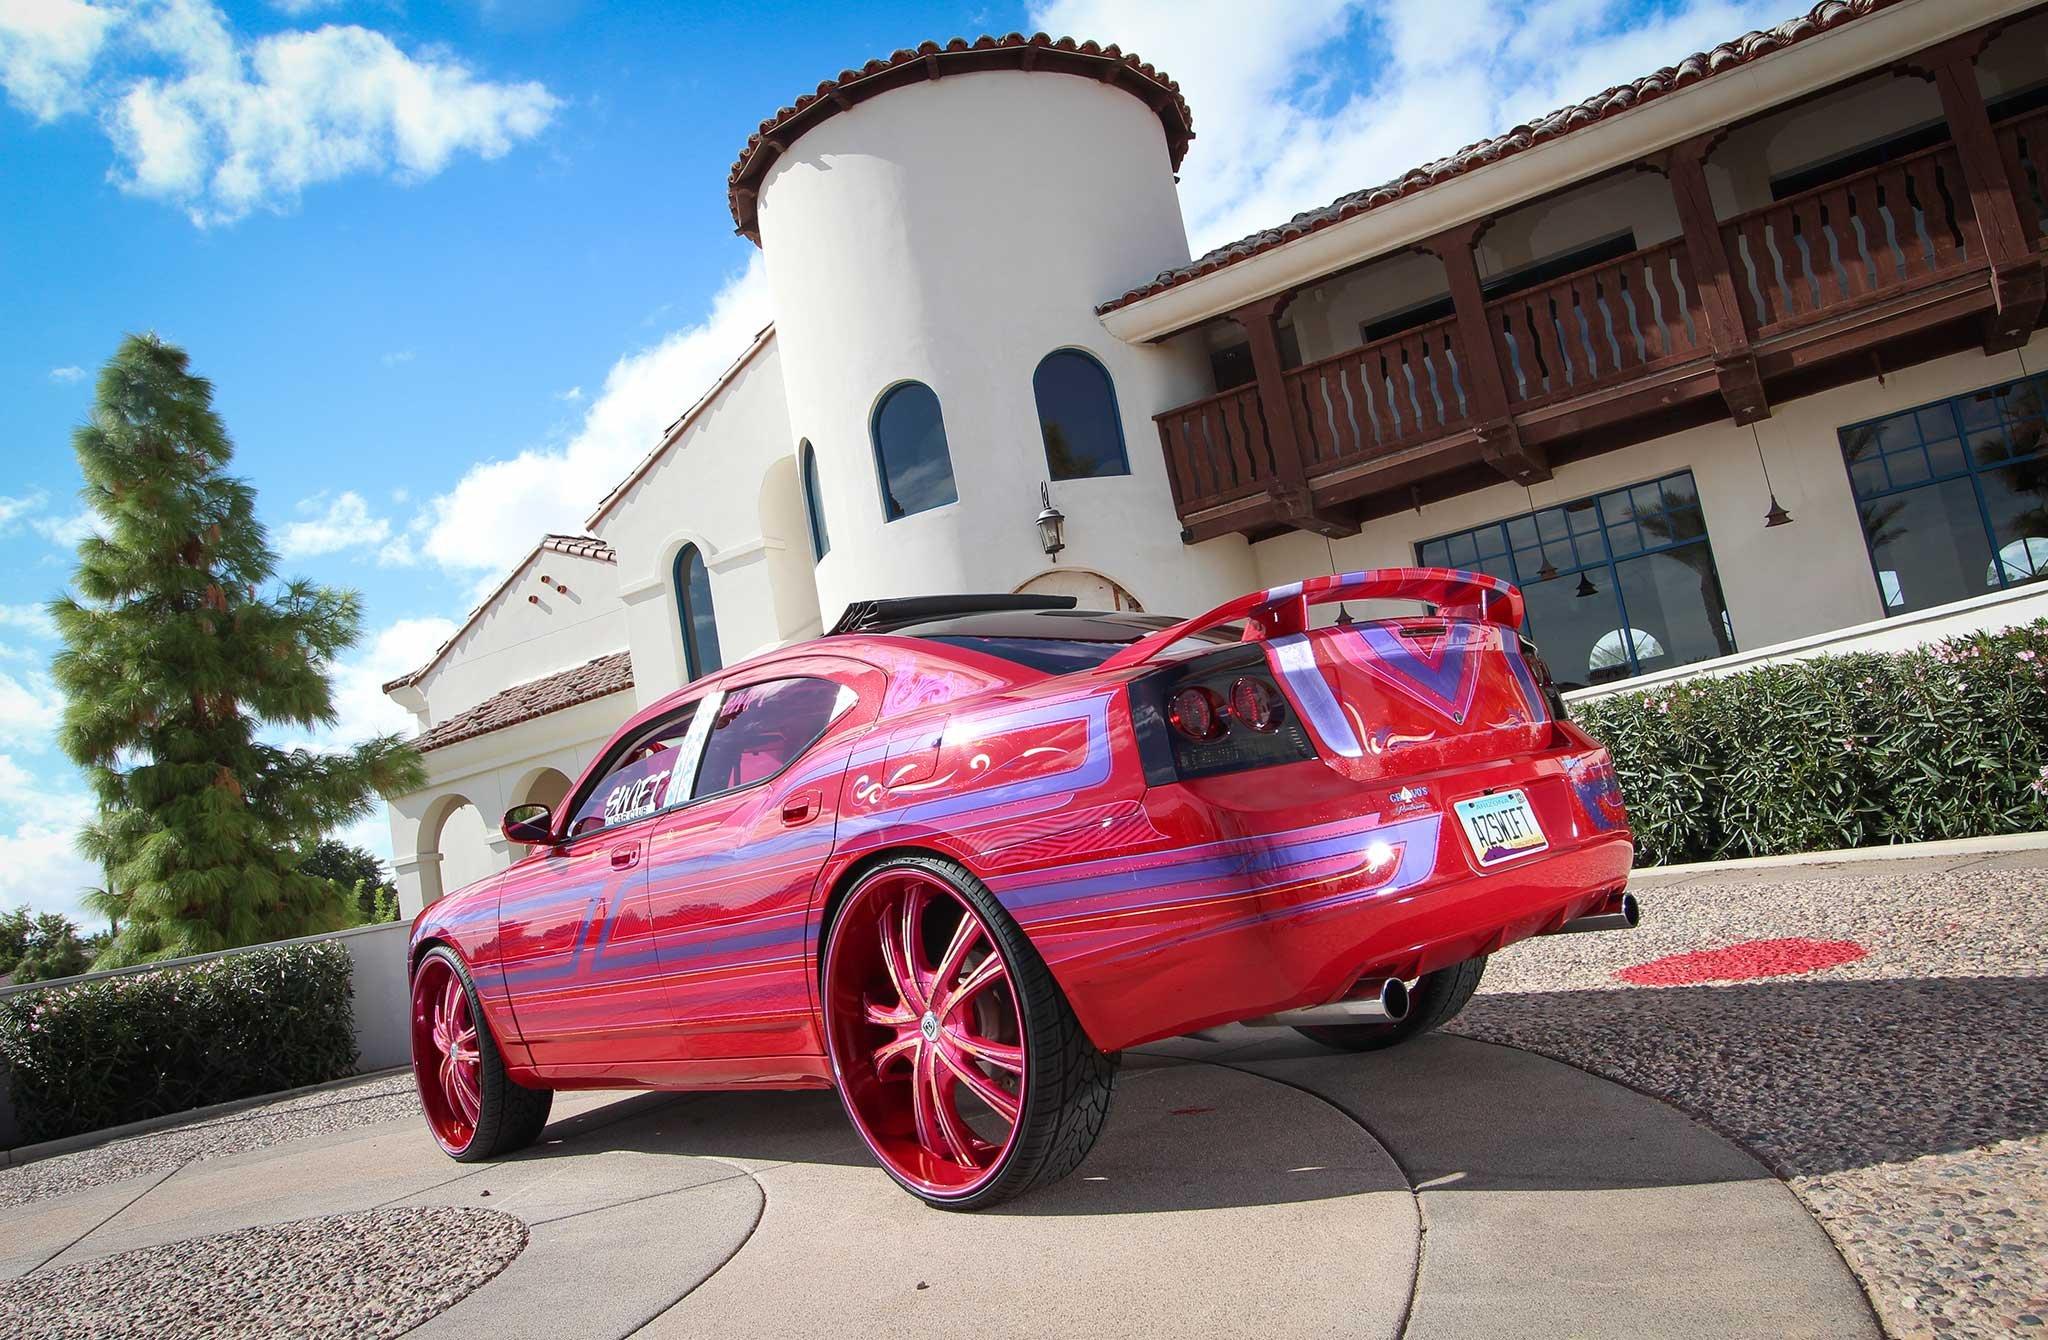 2008 Dodge Charger Custom Tuning Hot Rods Rod Gangsta Lowrider Wallpaper 2048x1340 972138 Wallpaperup